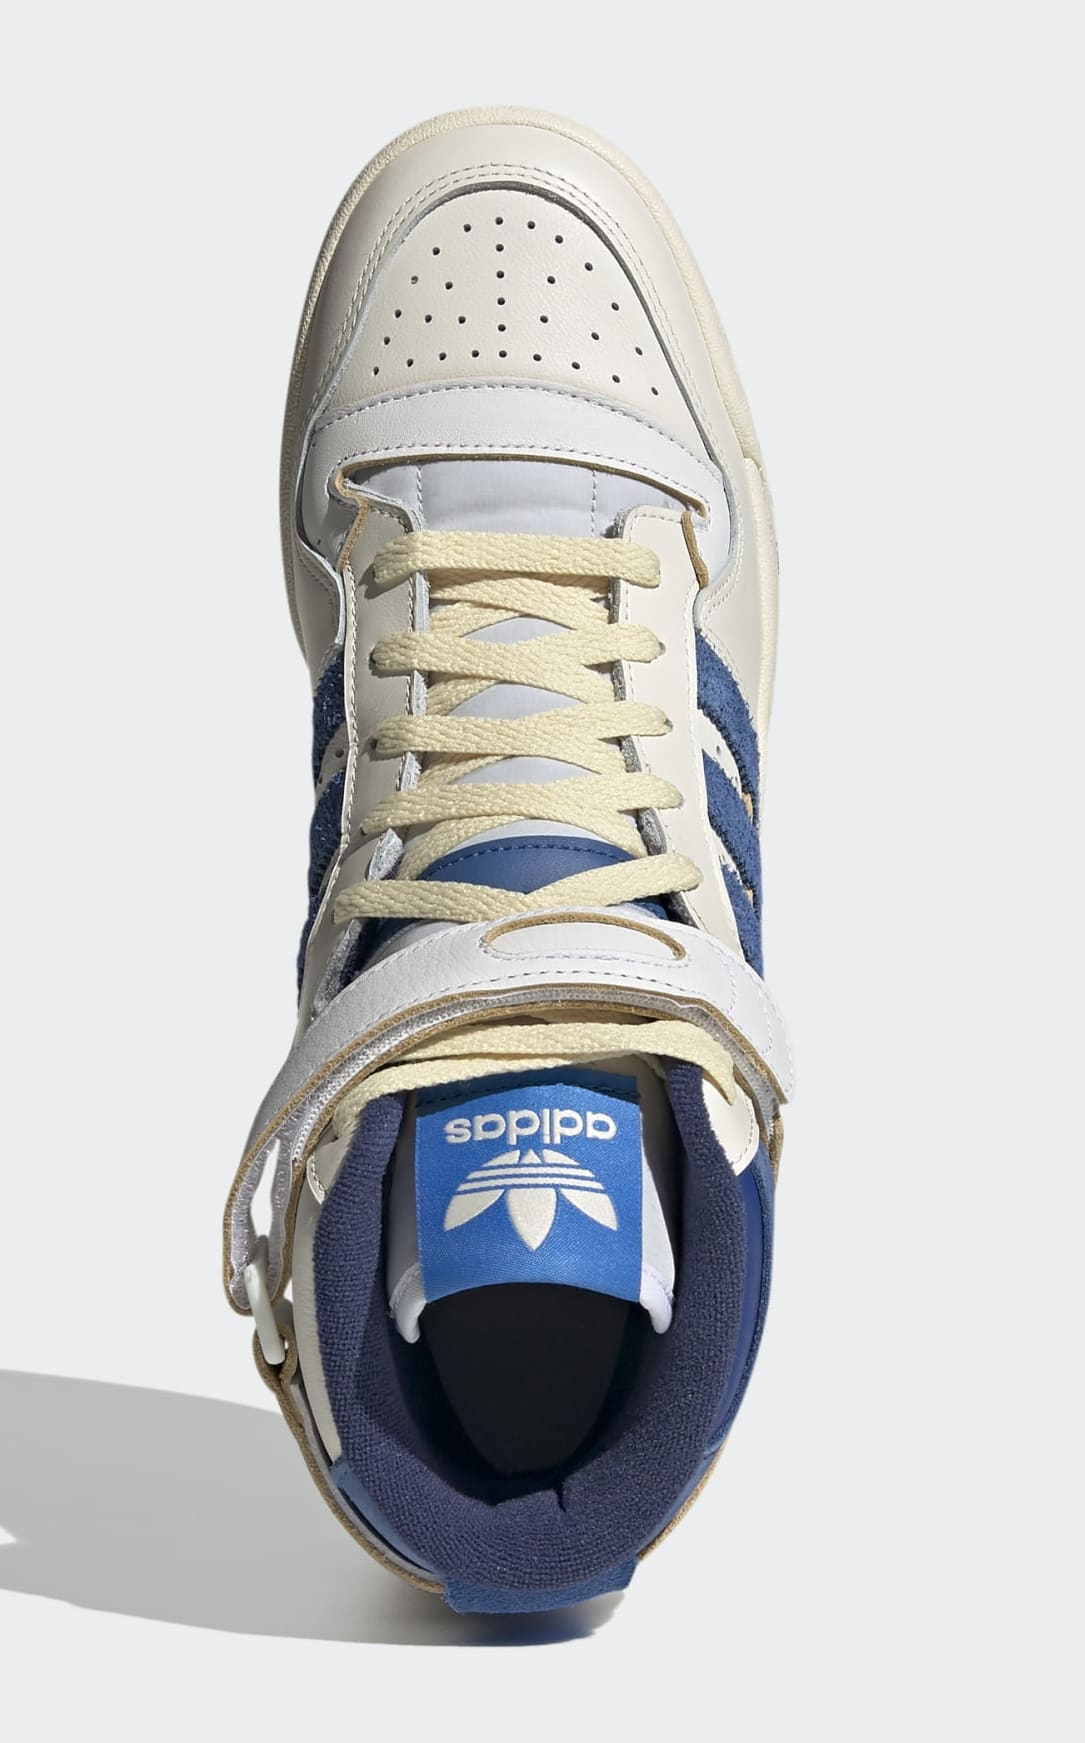 Adidas OG Forum 84 FY7793 Top